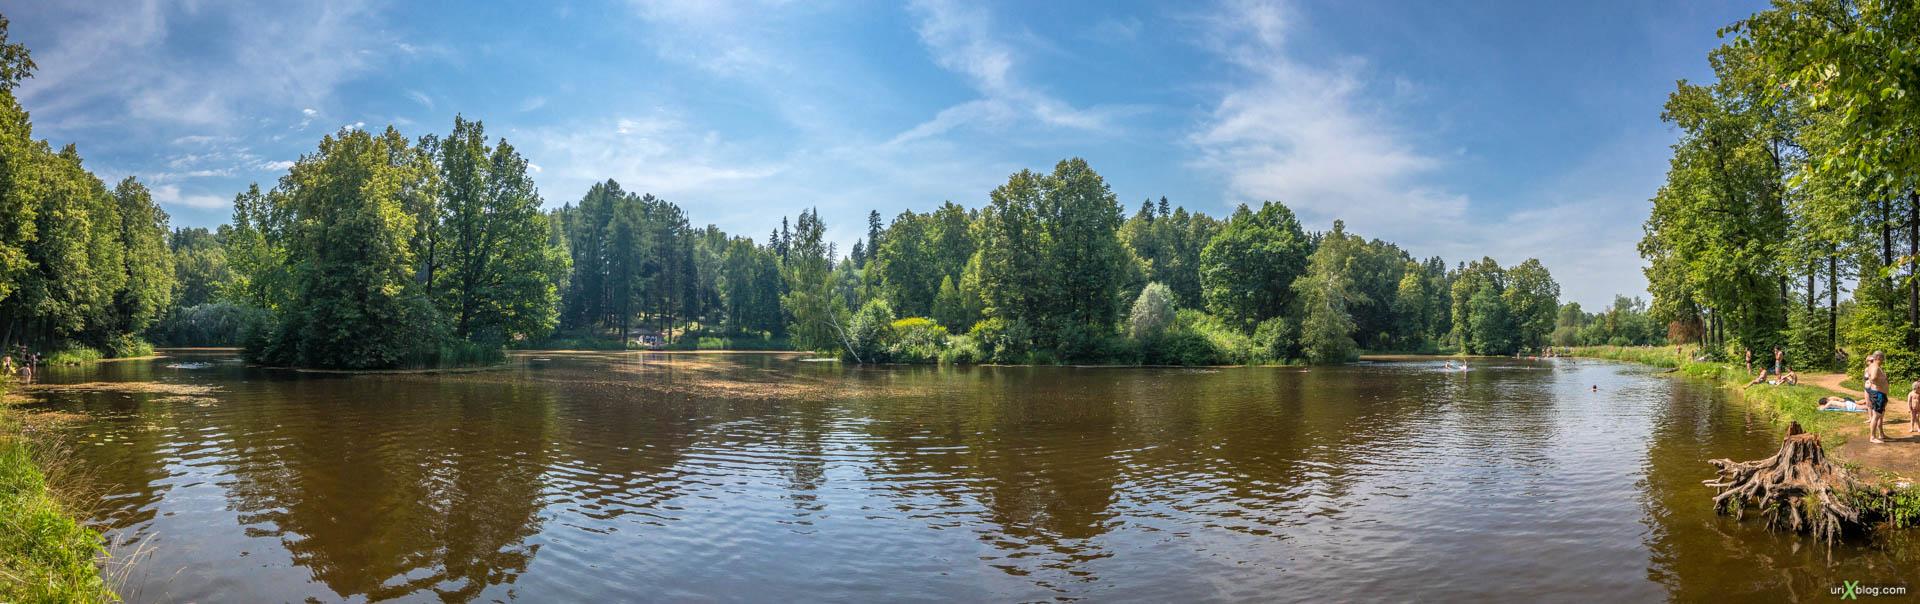 Barsky pond, lake, Serednikovo homestead, Russia